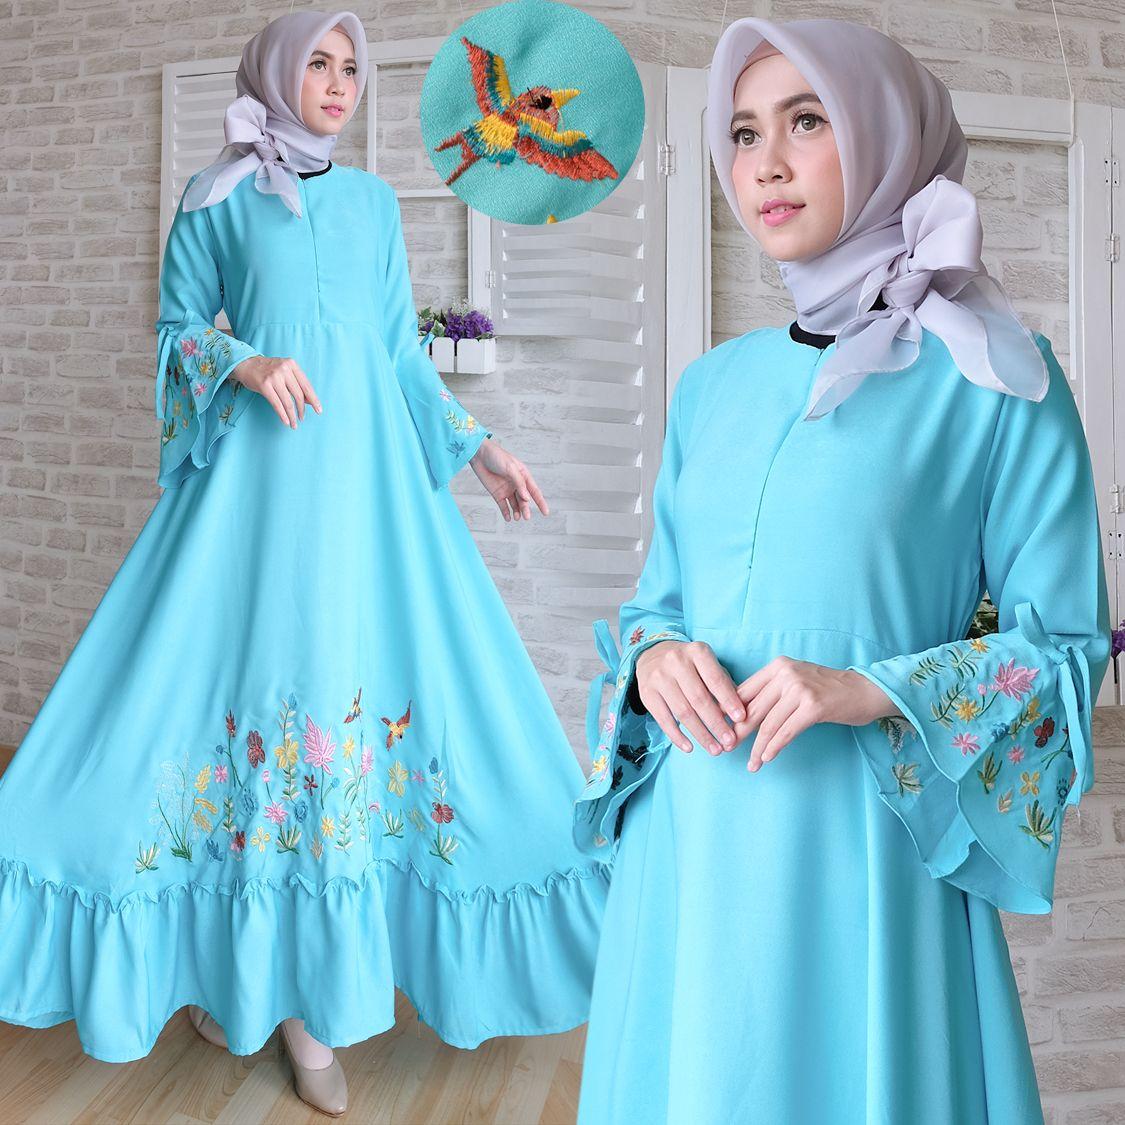 Gamis modern crepe aplikasi bordir baju muslim remaja Baju gamis remaja